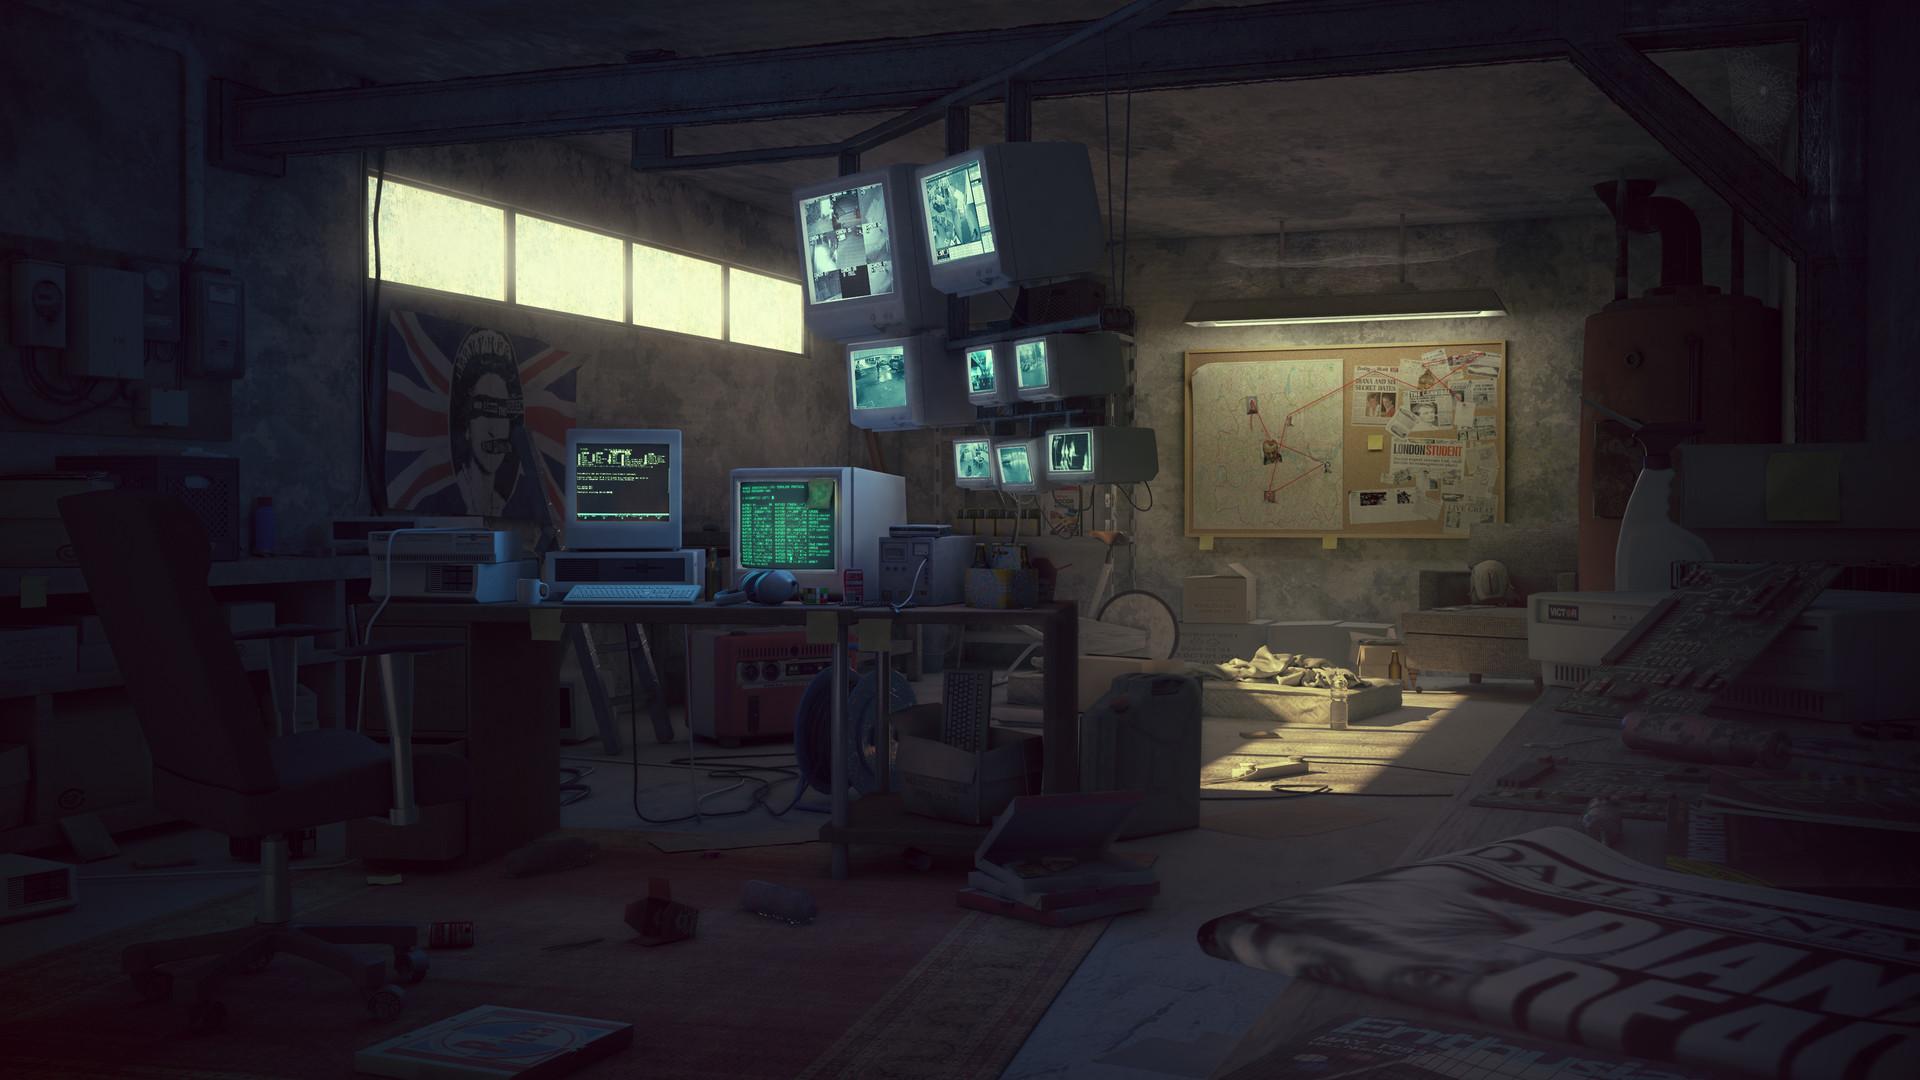 Bouriaud Louis Hacker Room